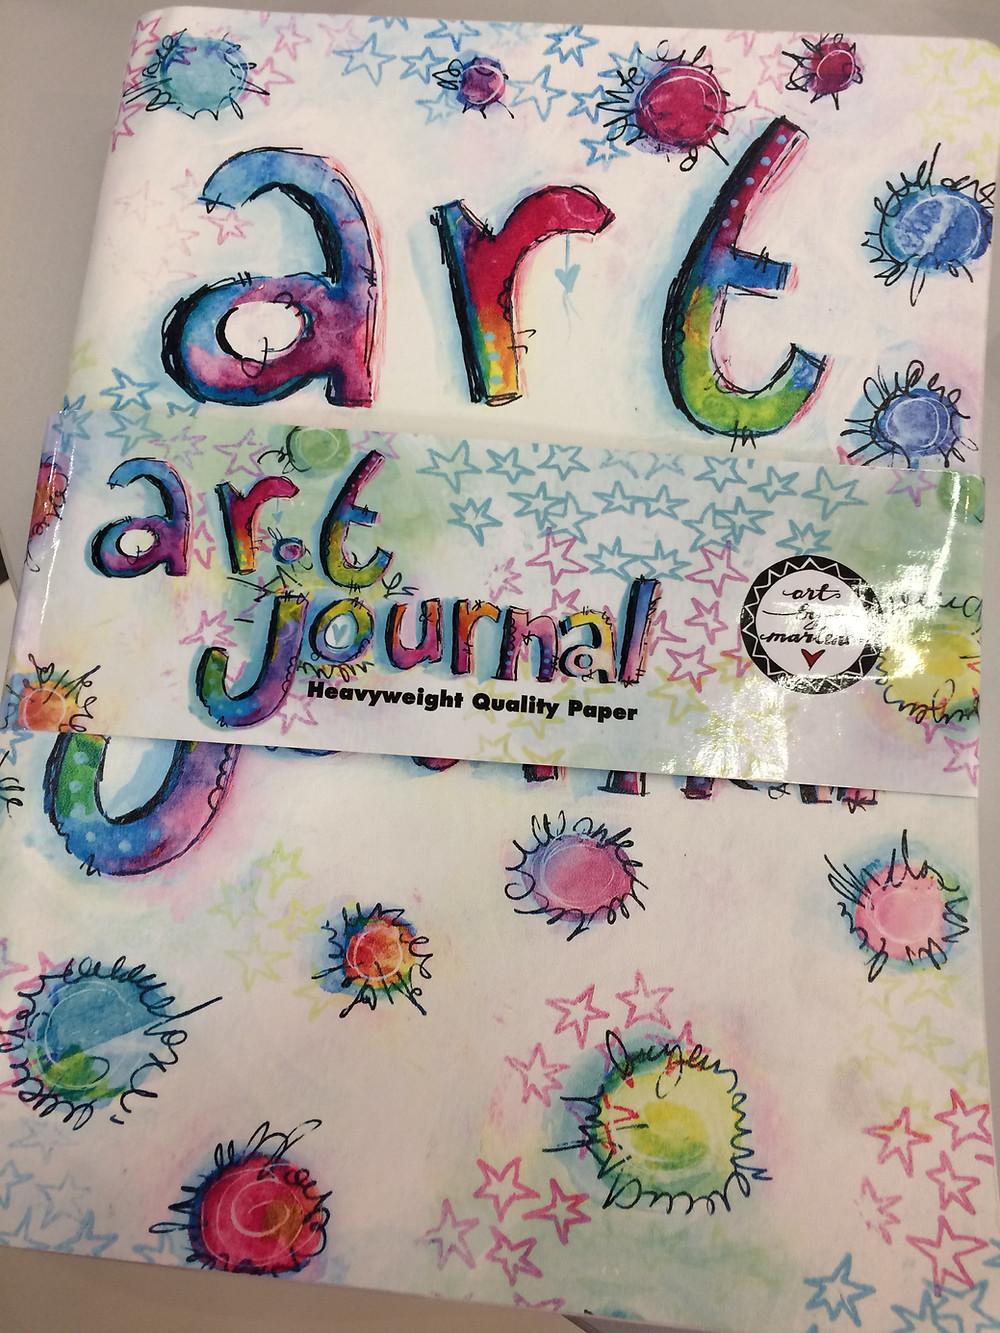 ART BY MARLENE ART JOURNAL